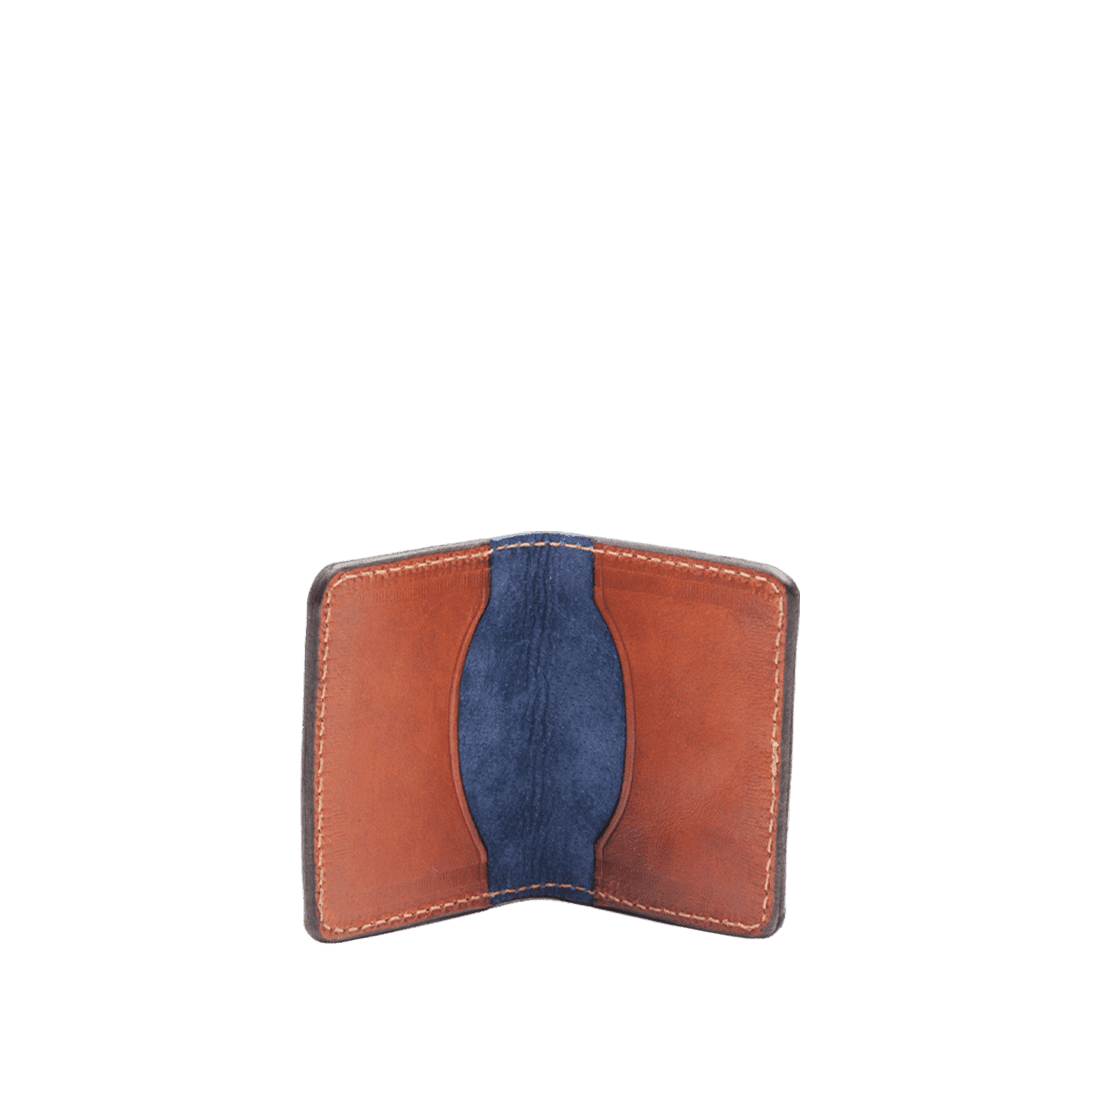 The card holder in matt tan